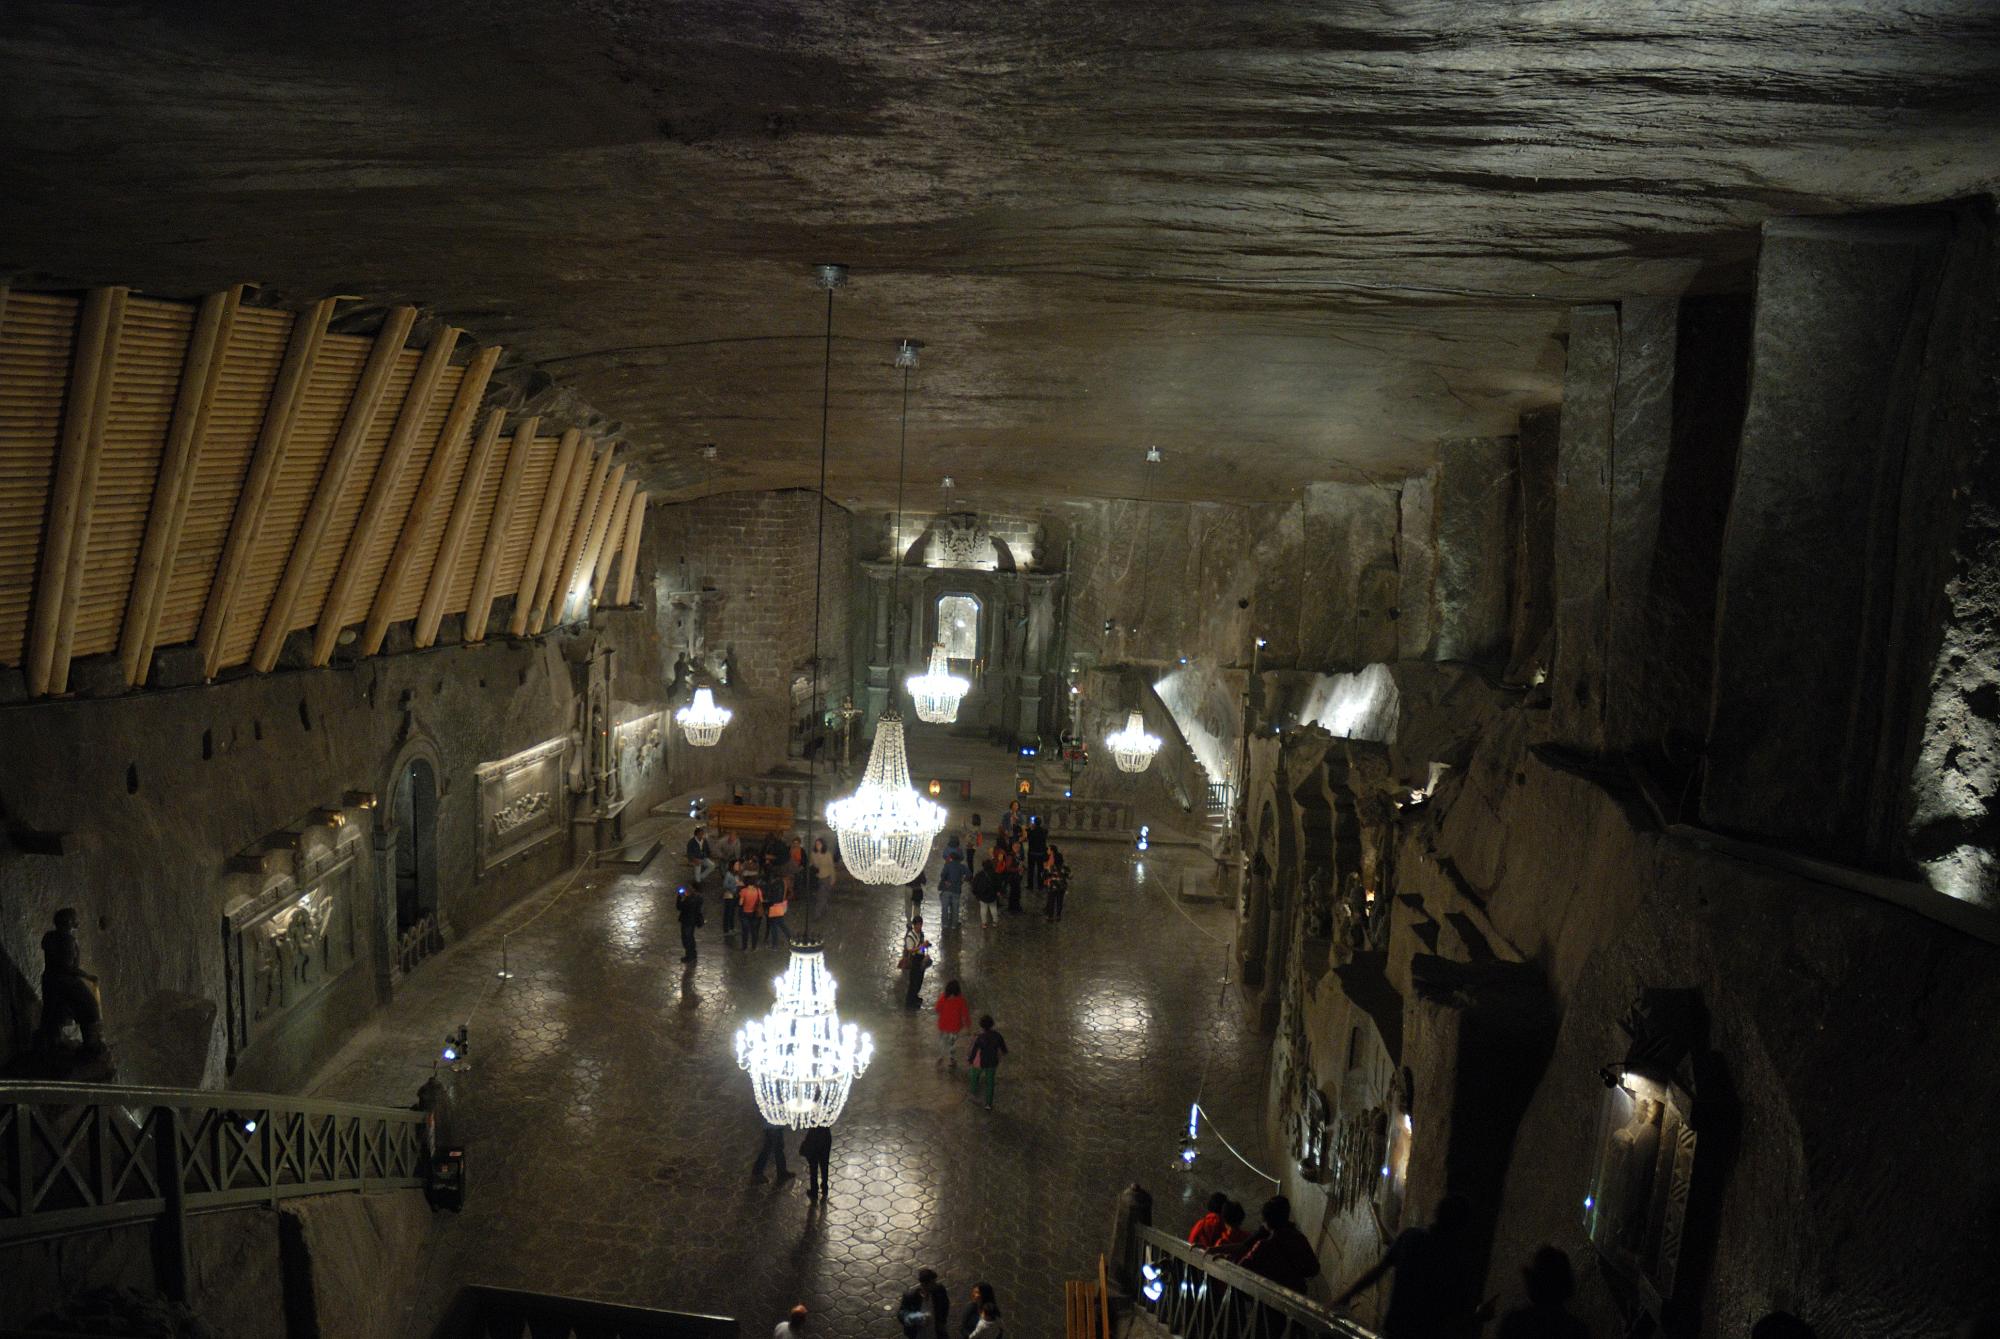 Minas de sal de Wieliczka. Capilla de sal